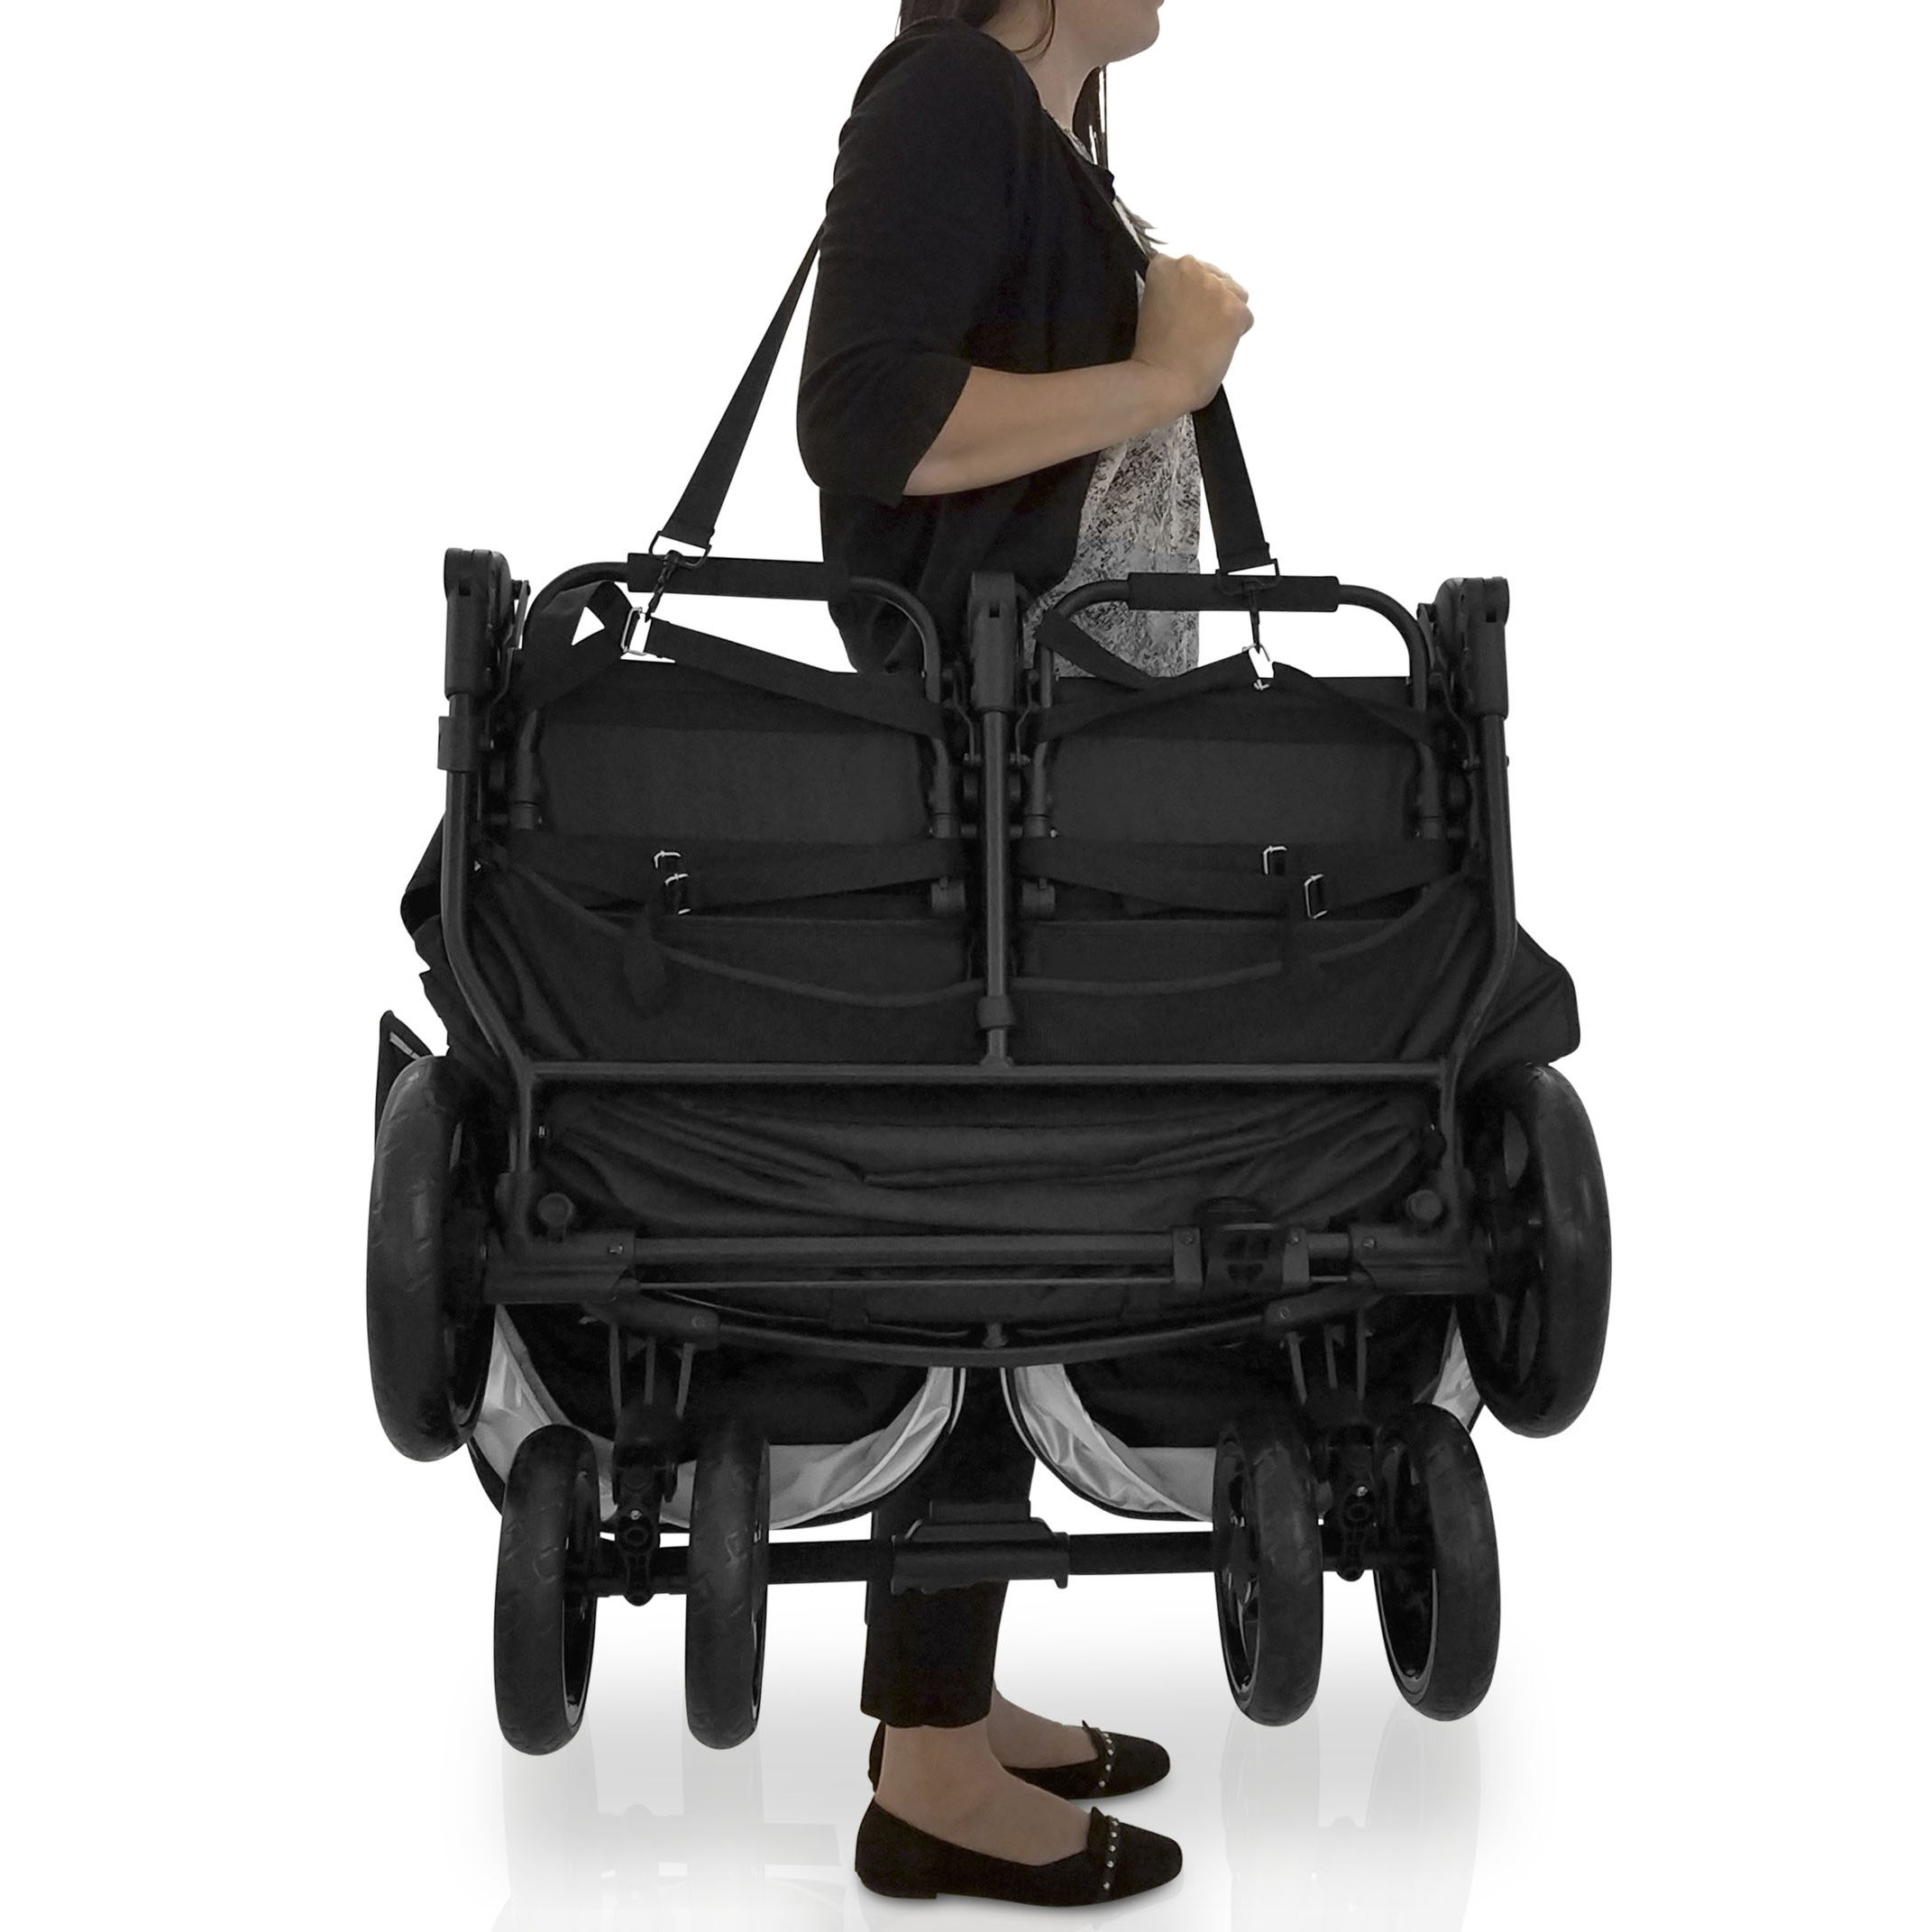 Jeep Destination Ultralight Side x Side Double Stroller, Midnight (Black) by Delta Children (Image #9)